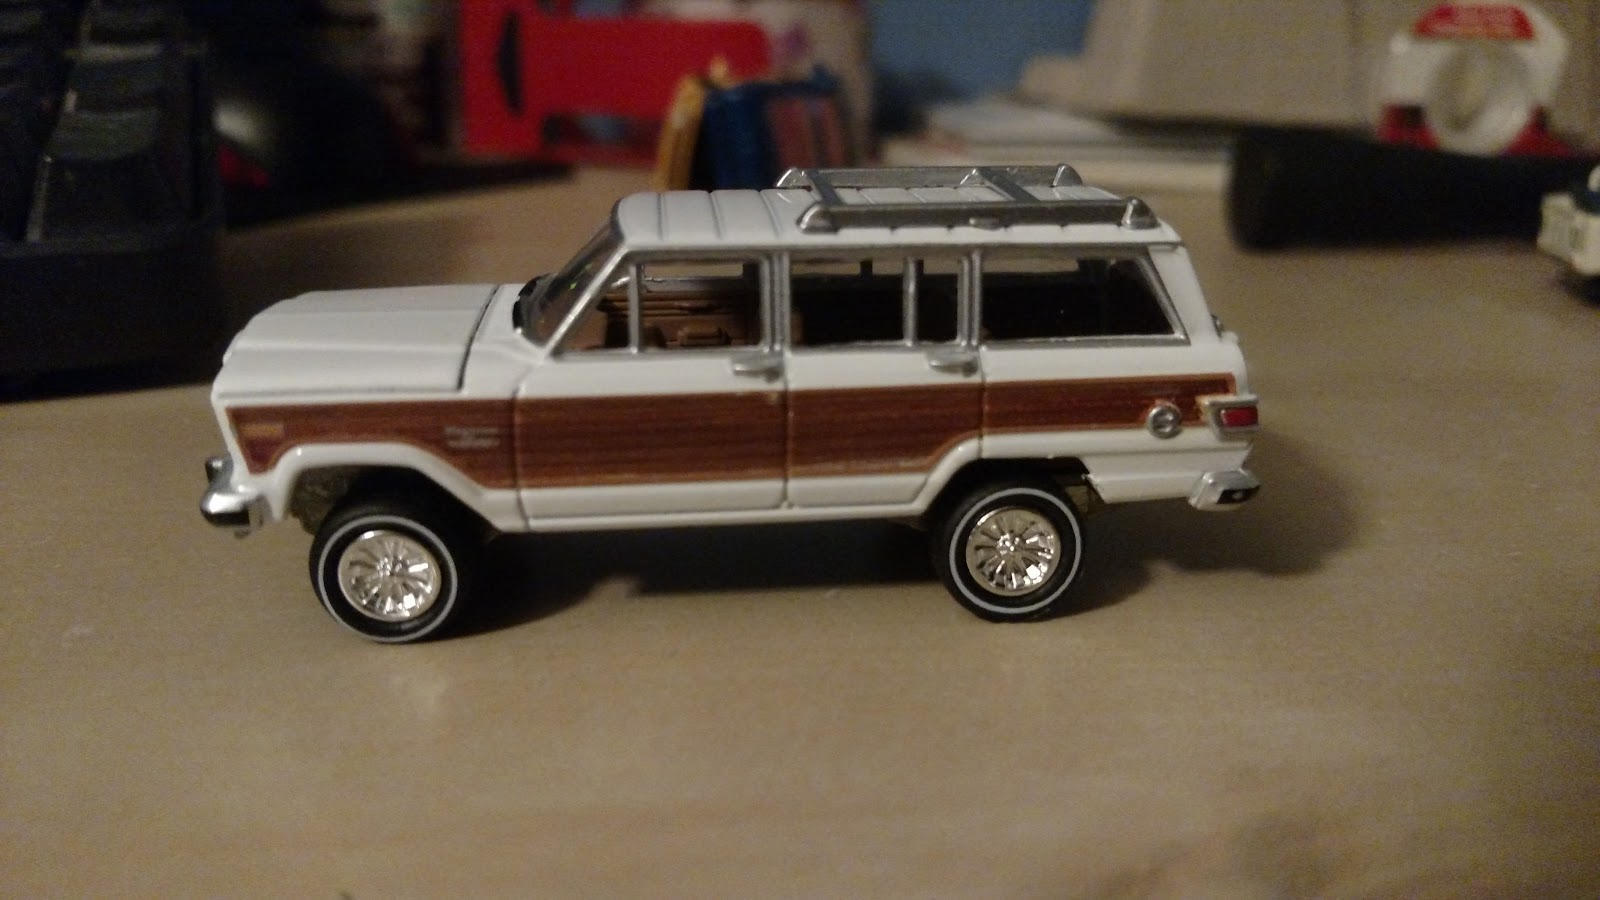 3inchdiecastbliss: johnny lightning's jeep grand wagoneer